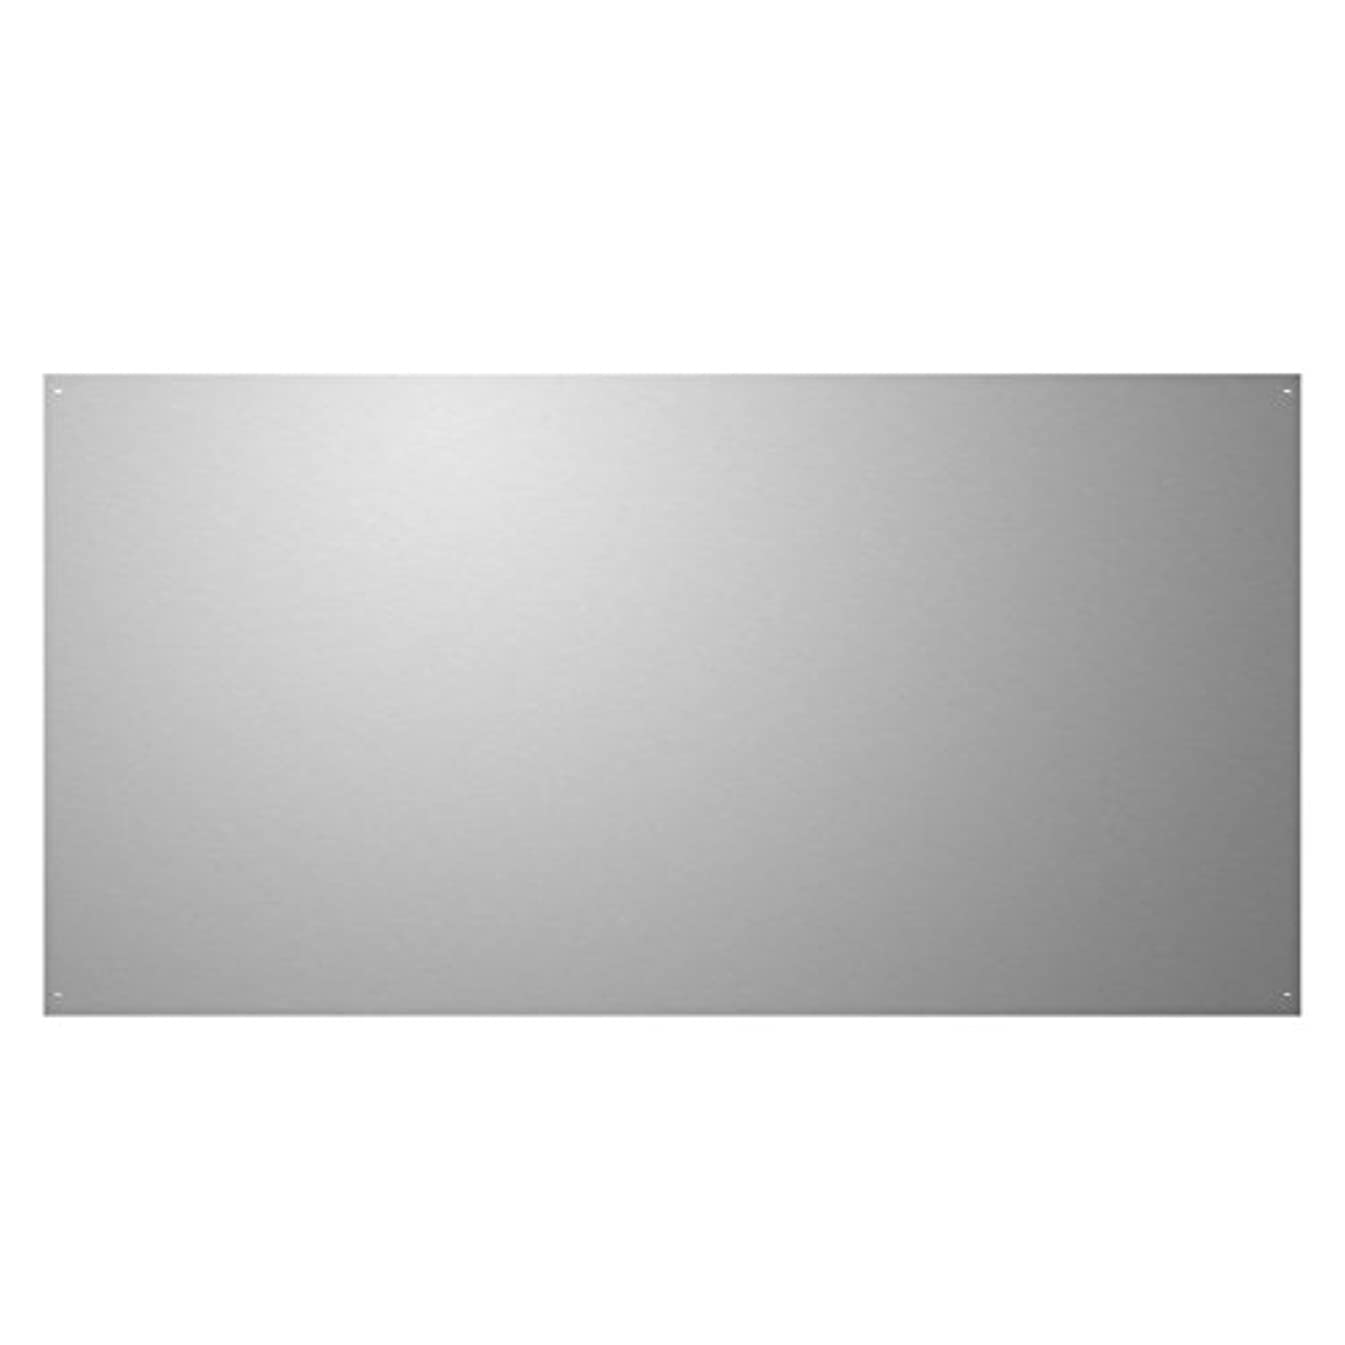 Stainless Steel Backsplash, 36